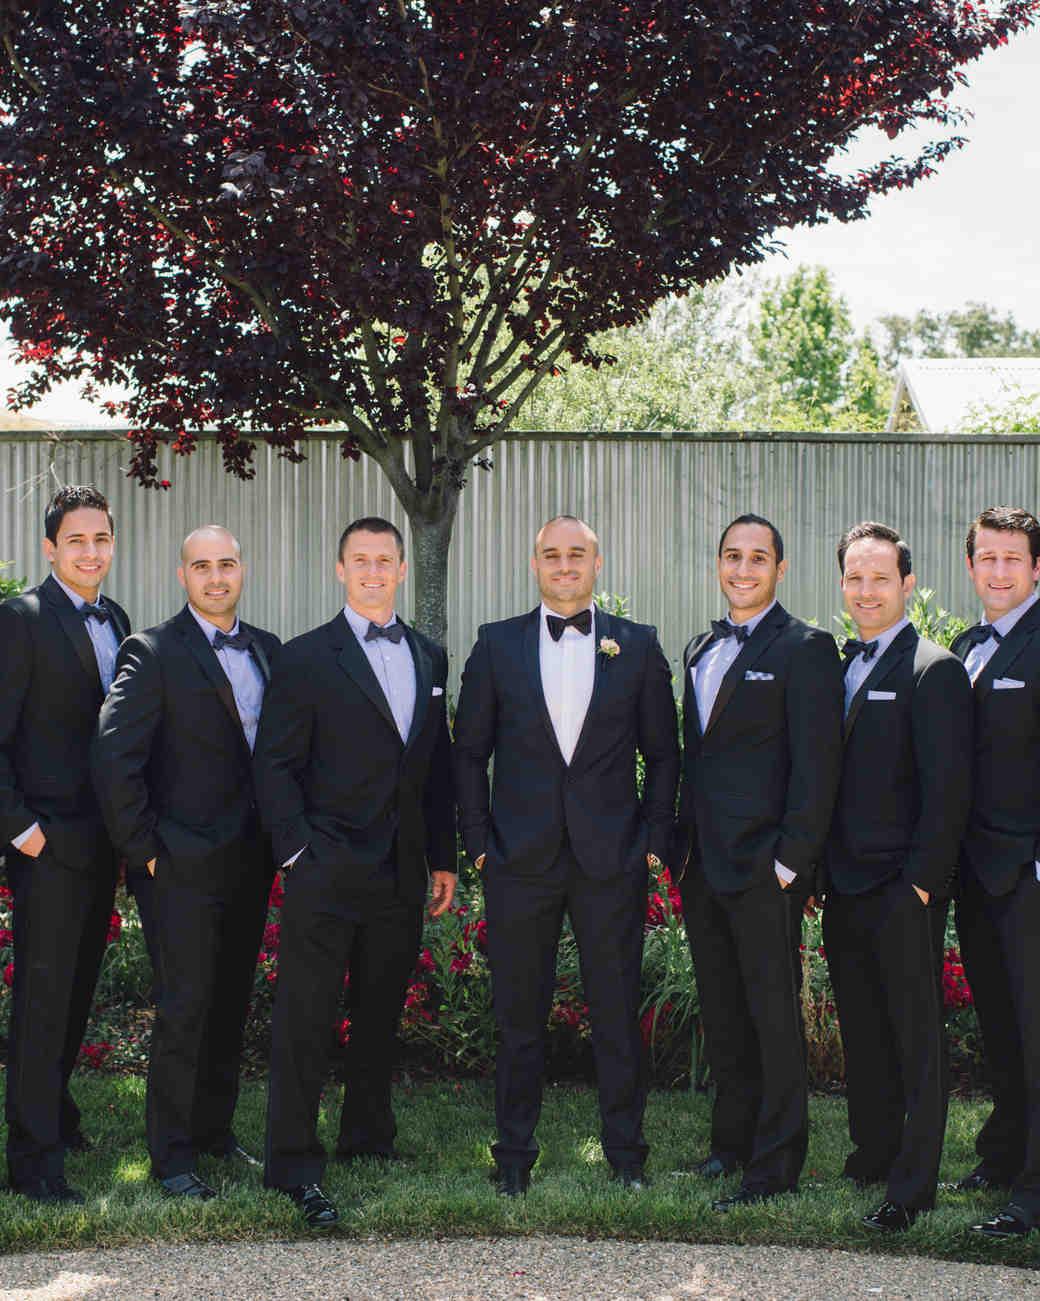 vanessa-joe-wedding-groomsmen-7545-s111736-1214.jpg